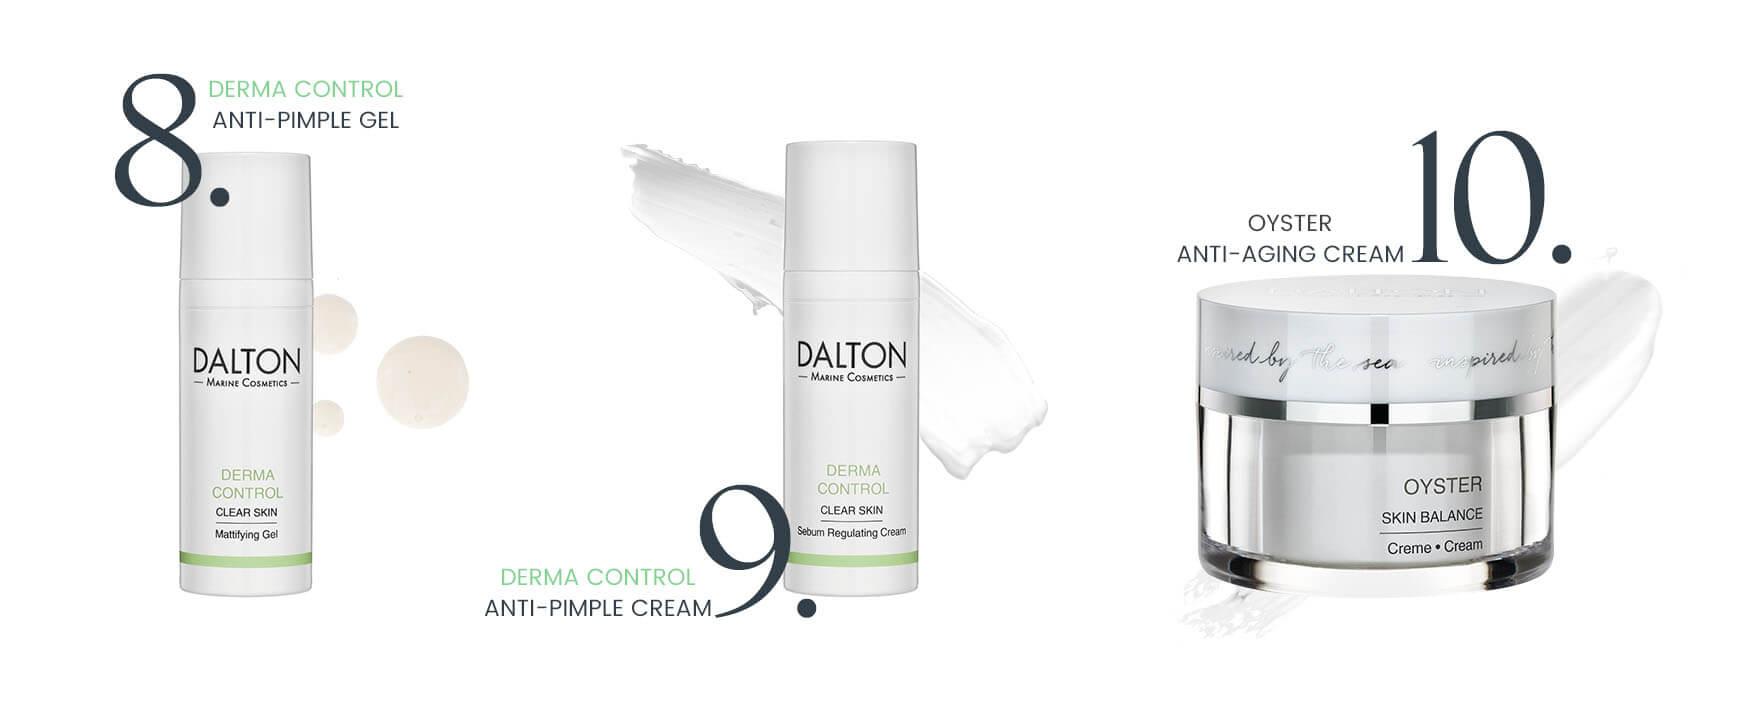 Anti-pimple moisturizers